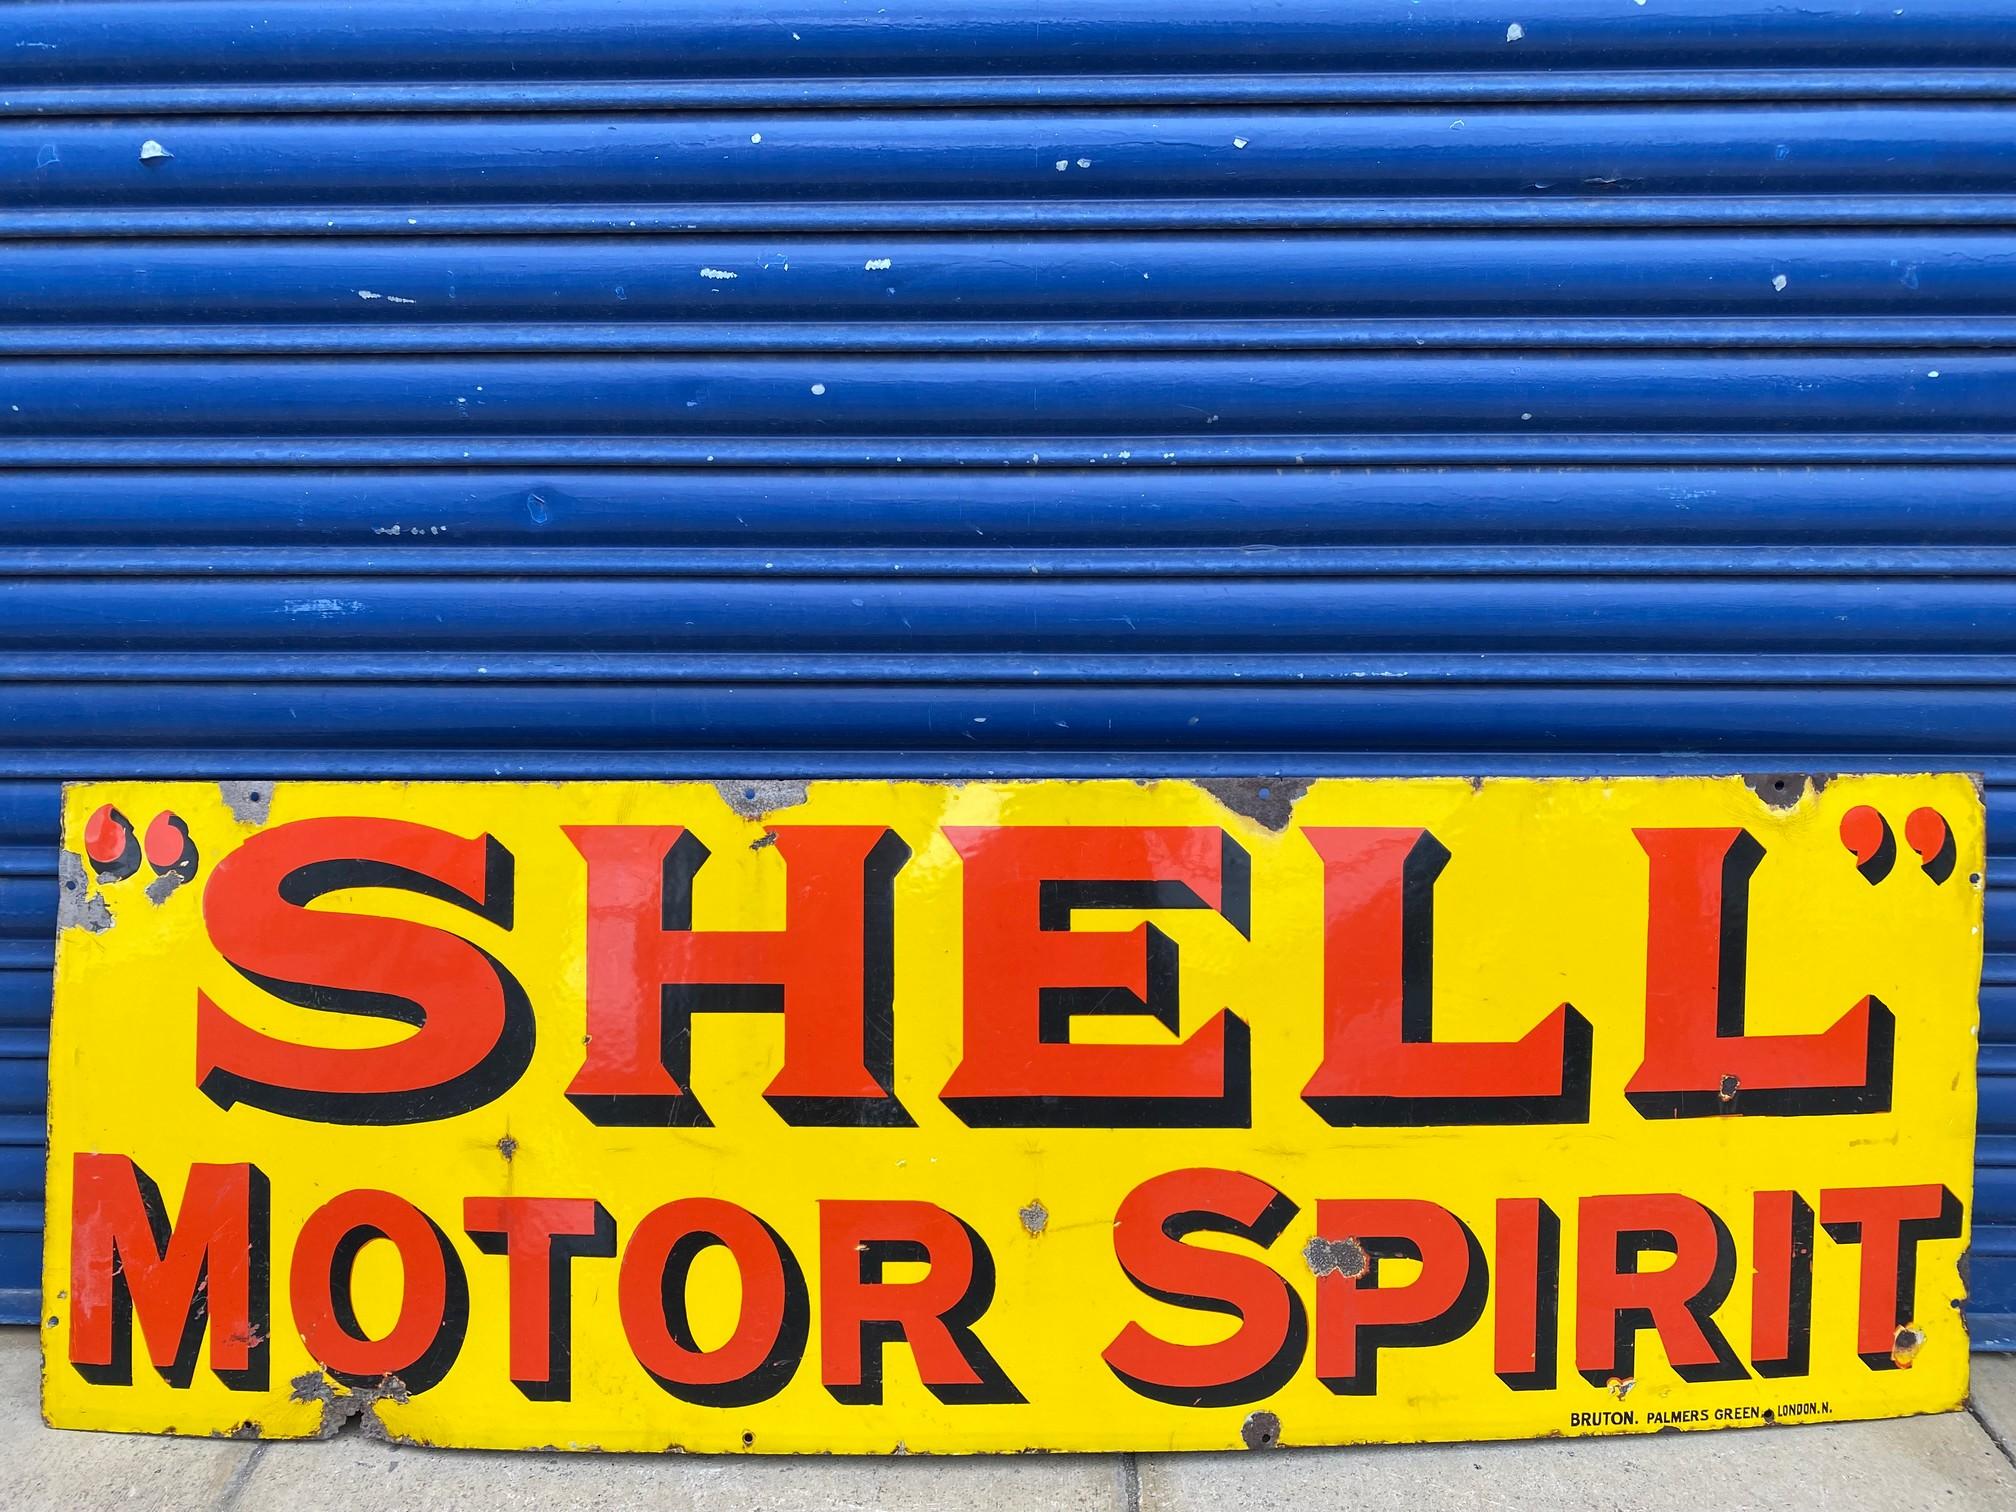 A Shell Motor Spirit rectangular enamel sign by Bruton of Palmers Green, excellent original